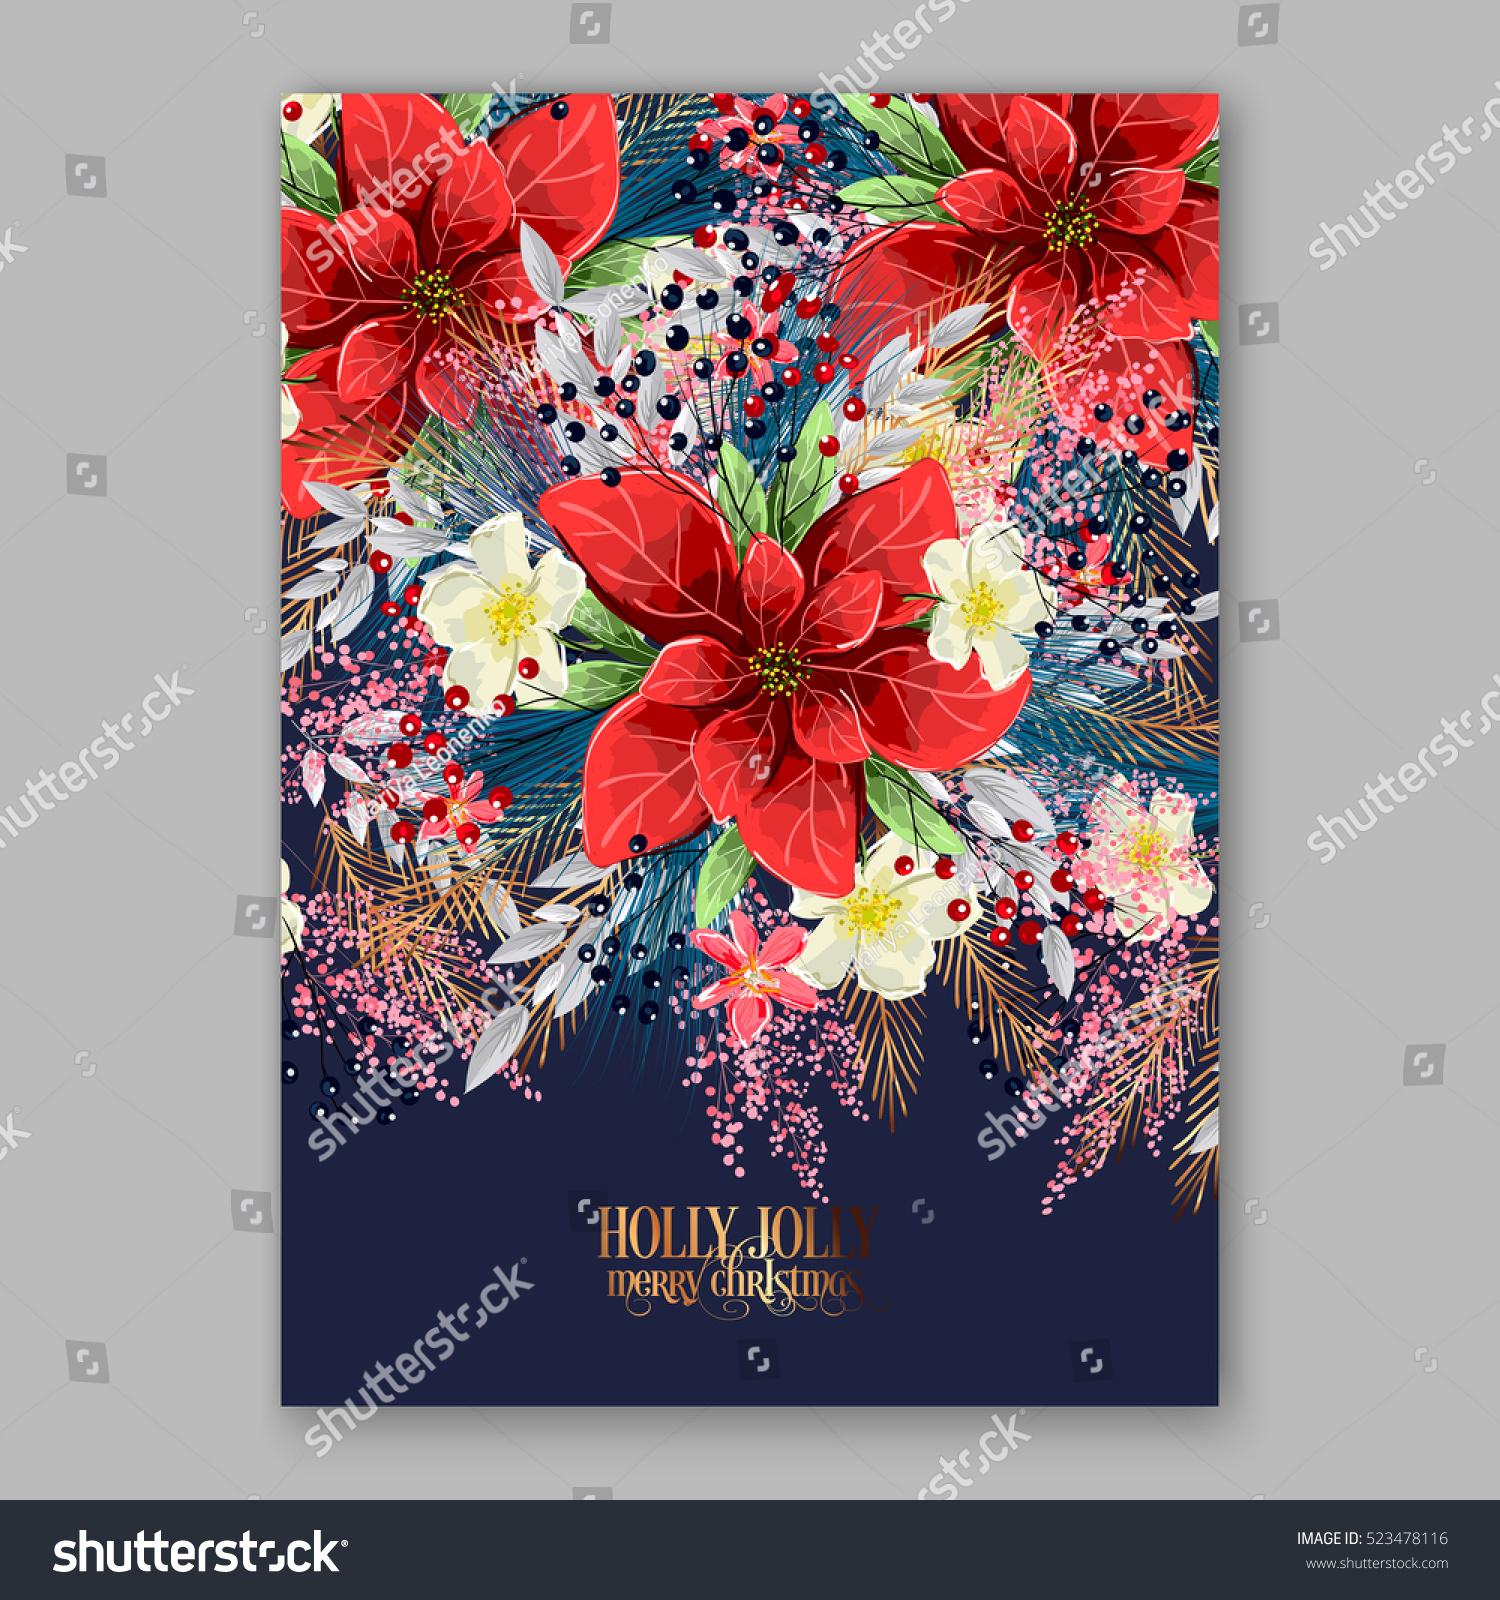 Poinsettia Christmas Party Invitation Sample Card Stock Vector HD ...